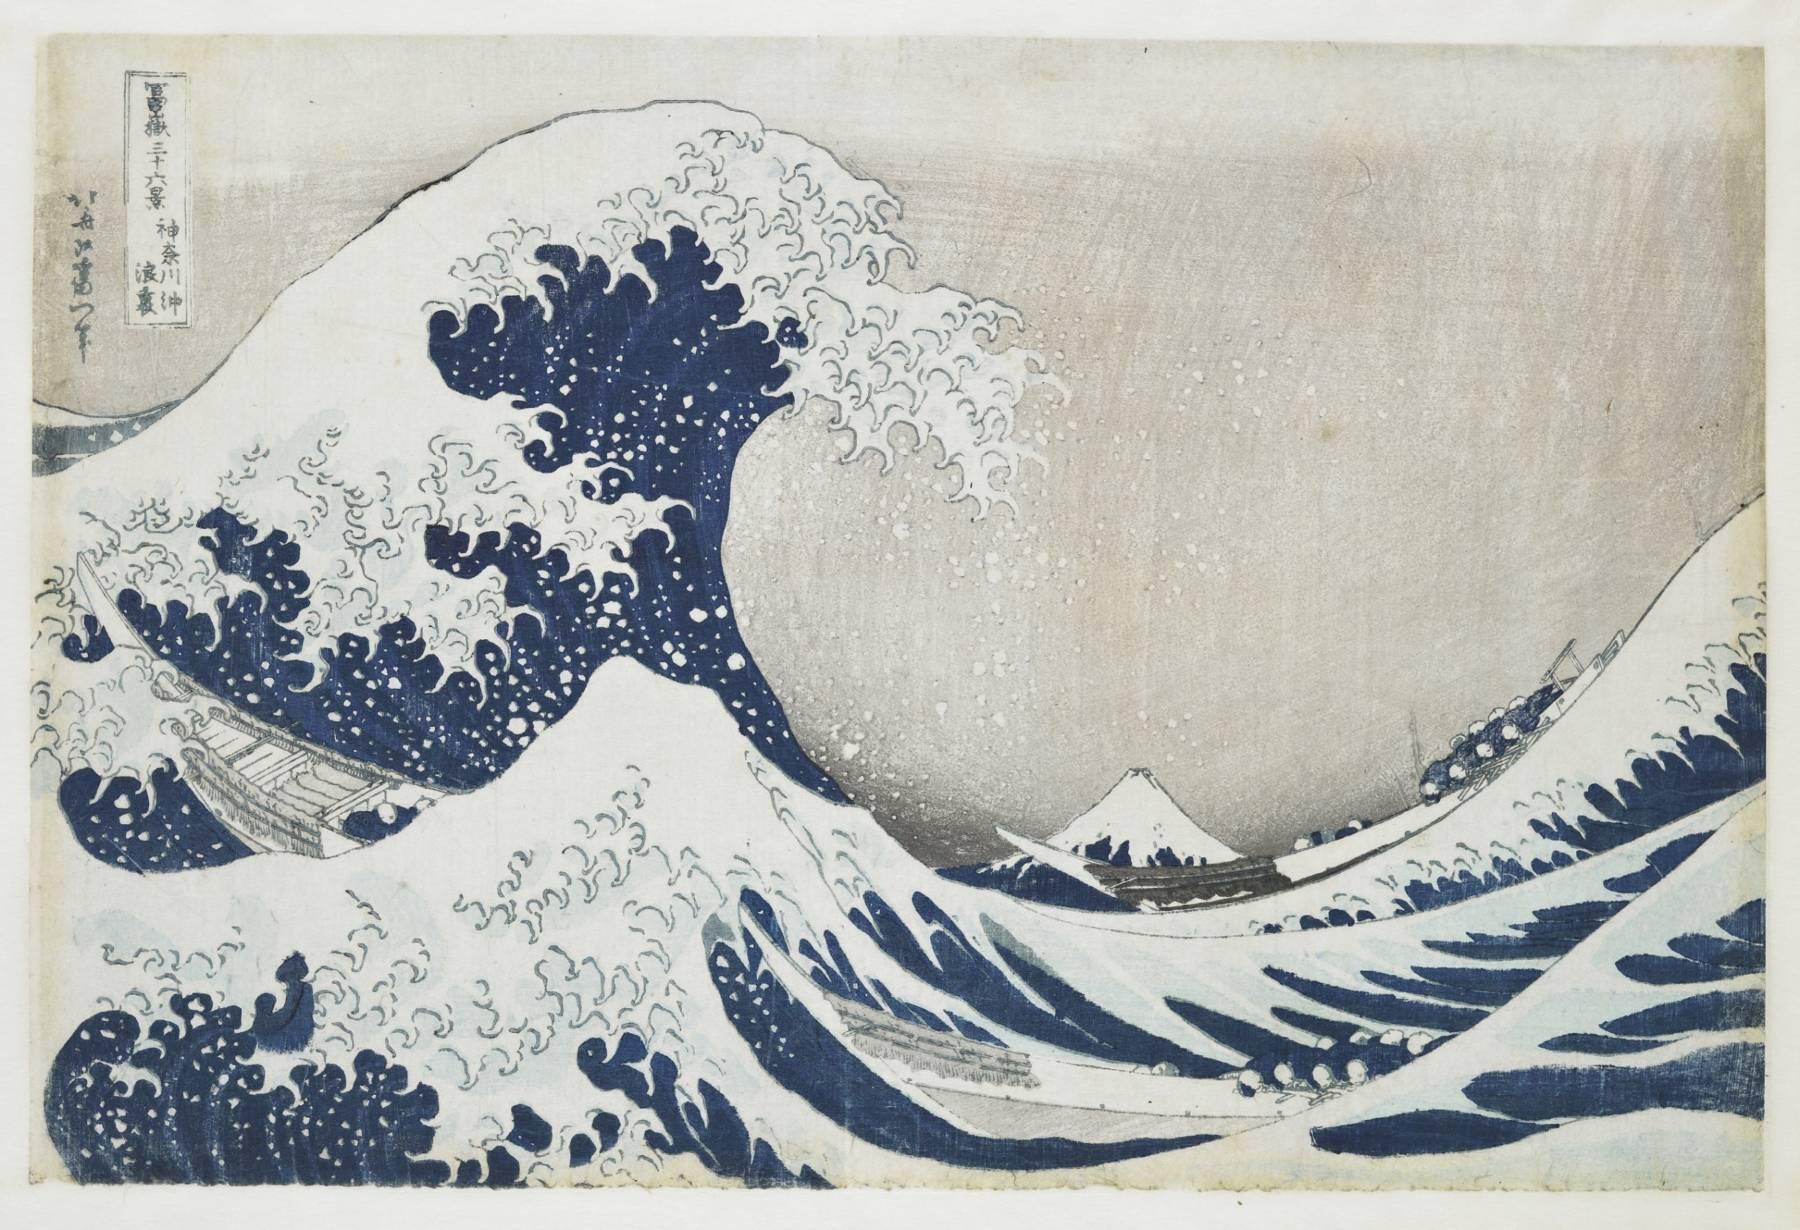 Katsushika Hokusai, Kanagawa-oki nami-ura. Sous la vague au large de Kanagawa